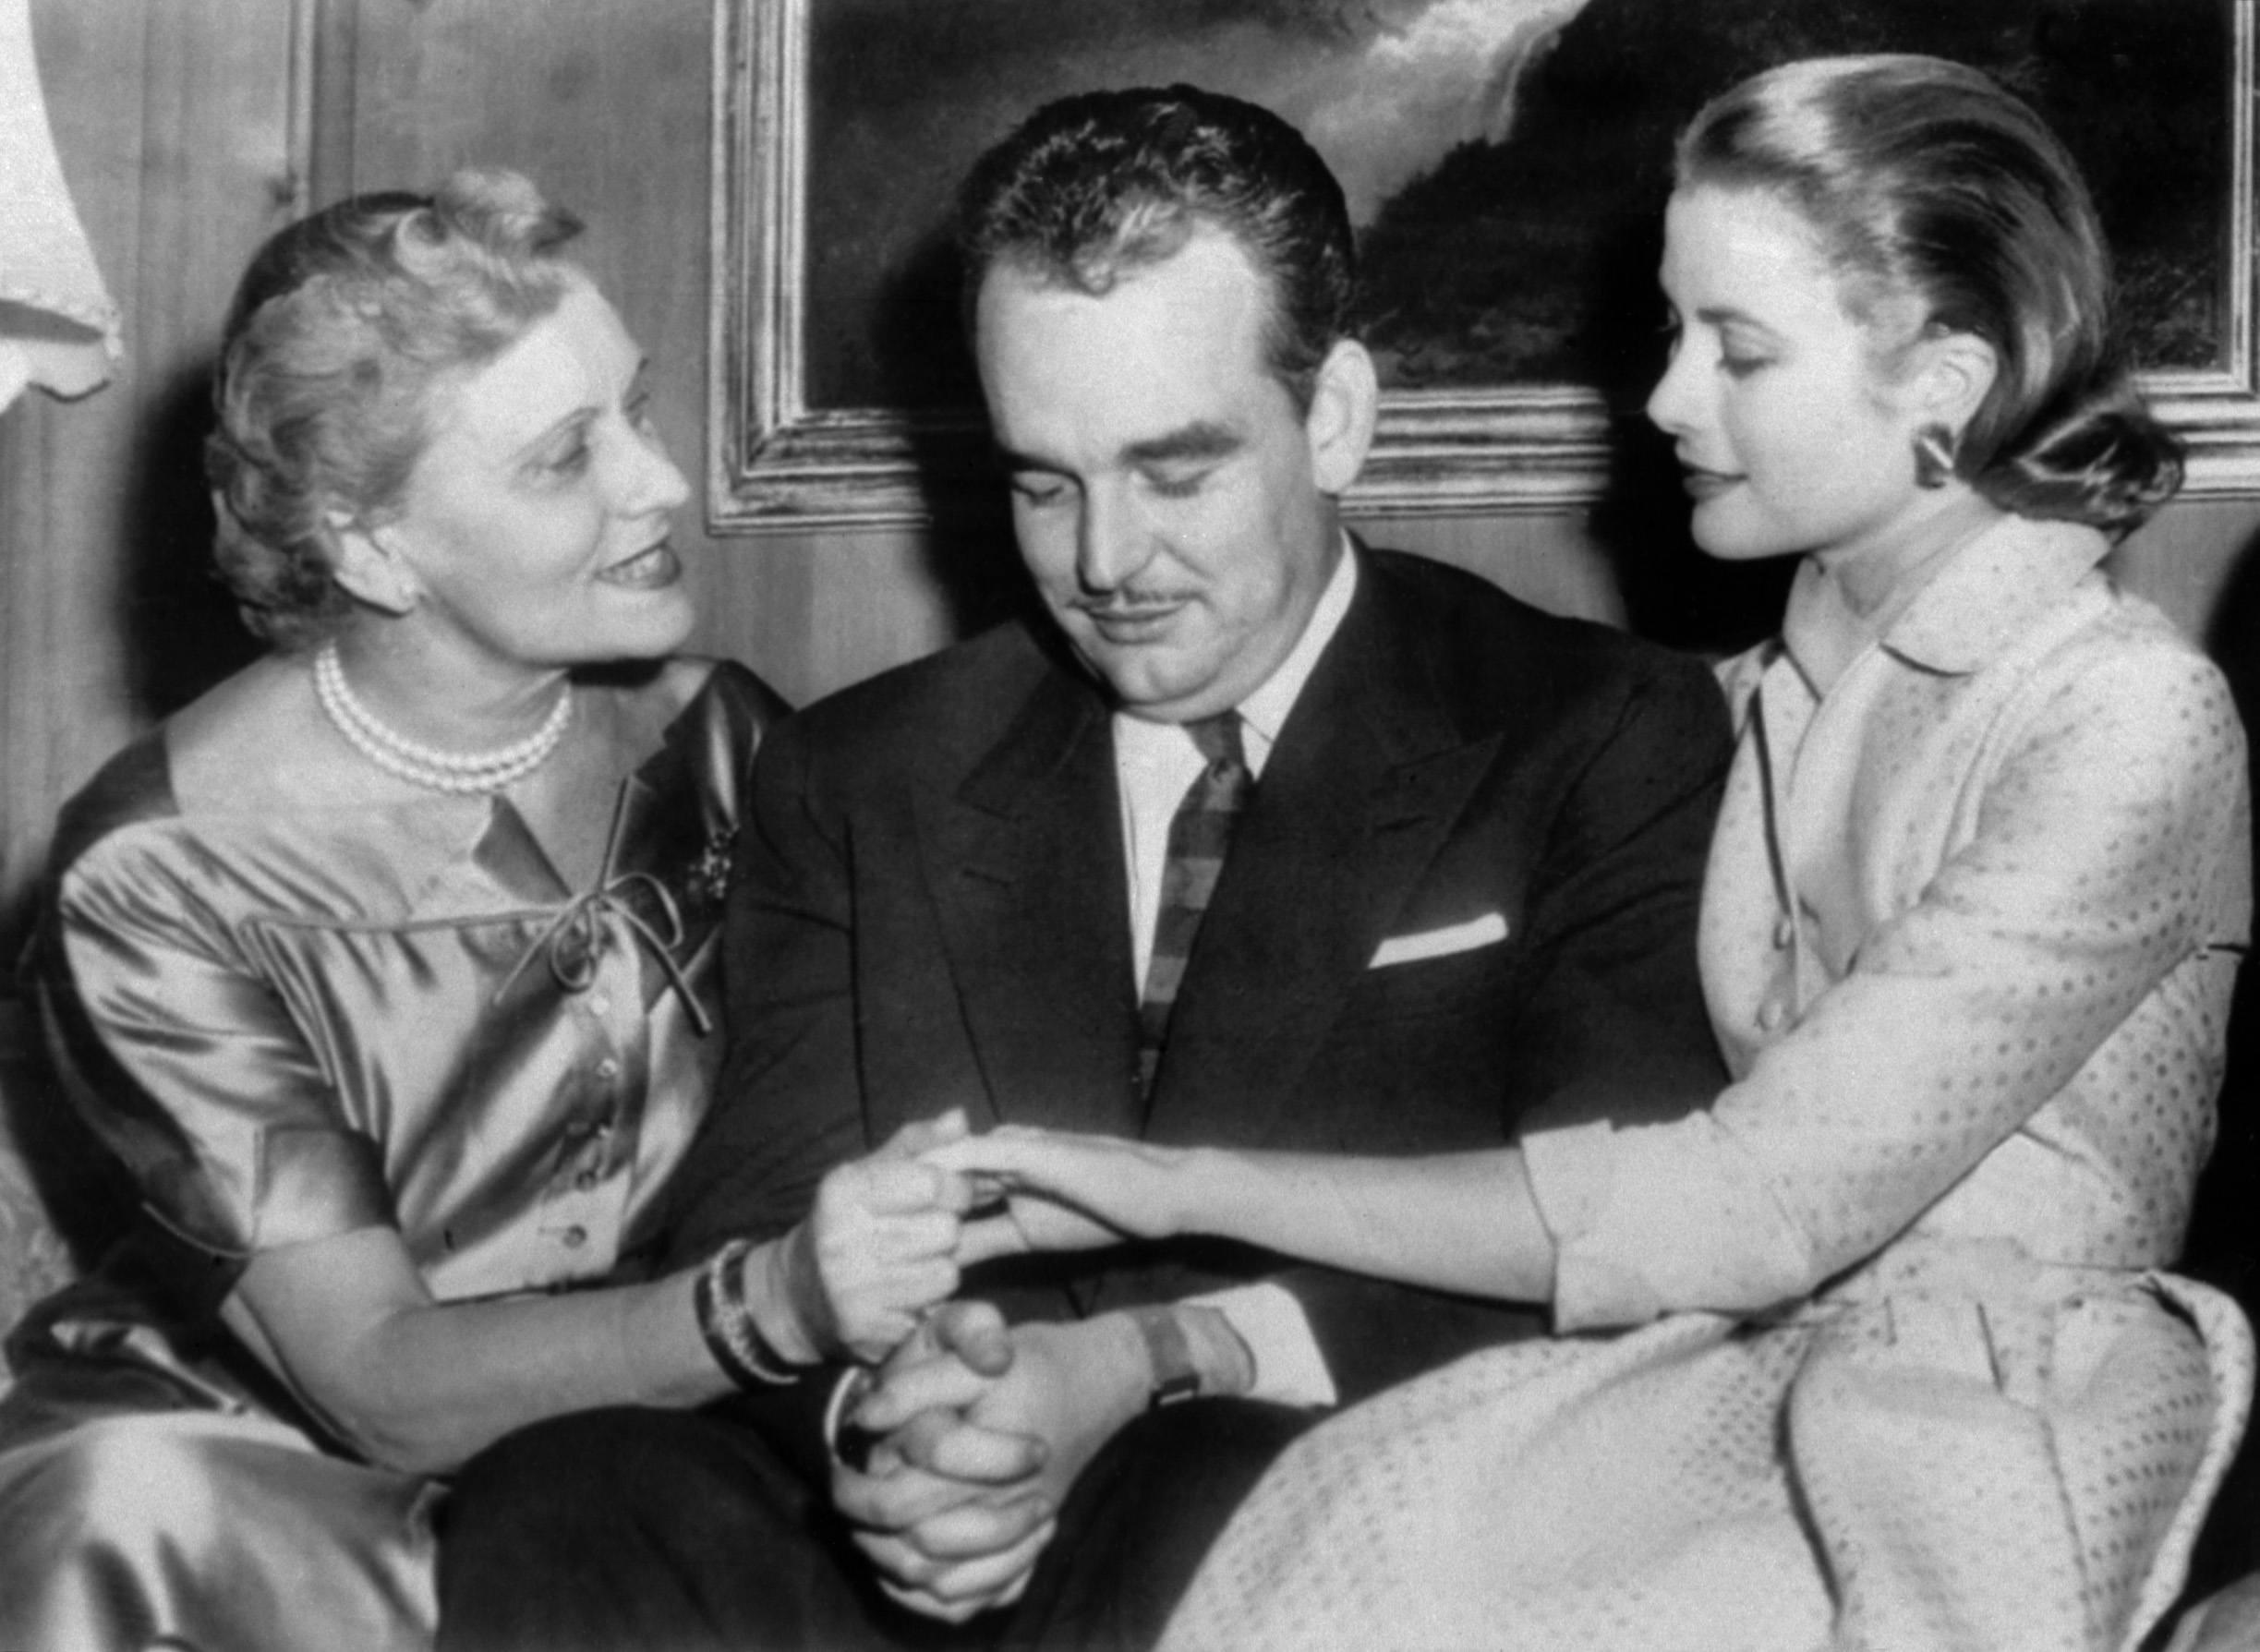 Prince Rainier III of Monaco (C) and grace kelly